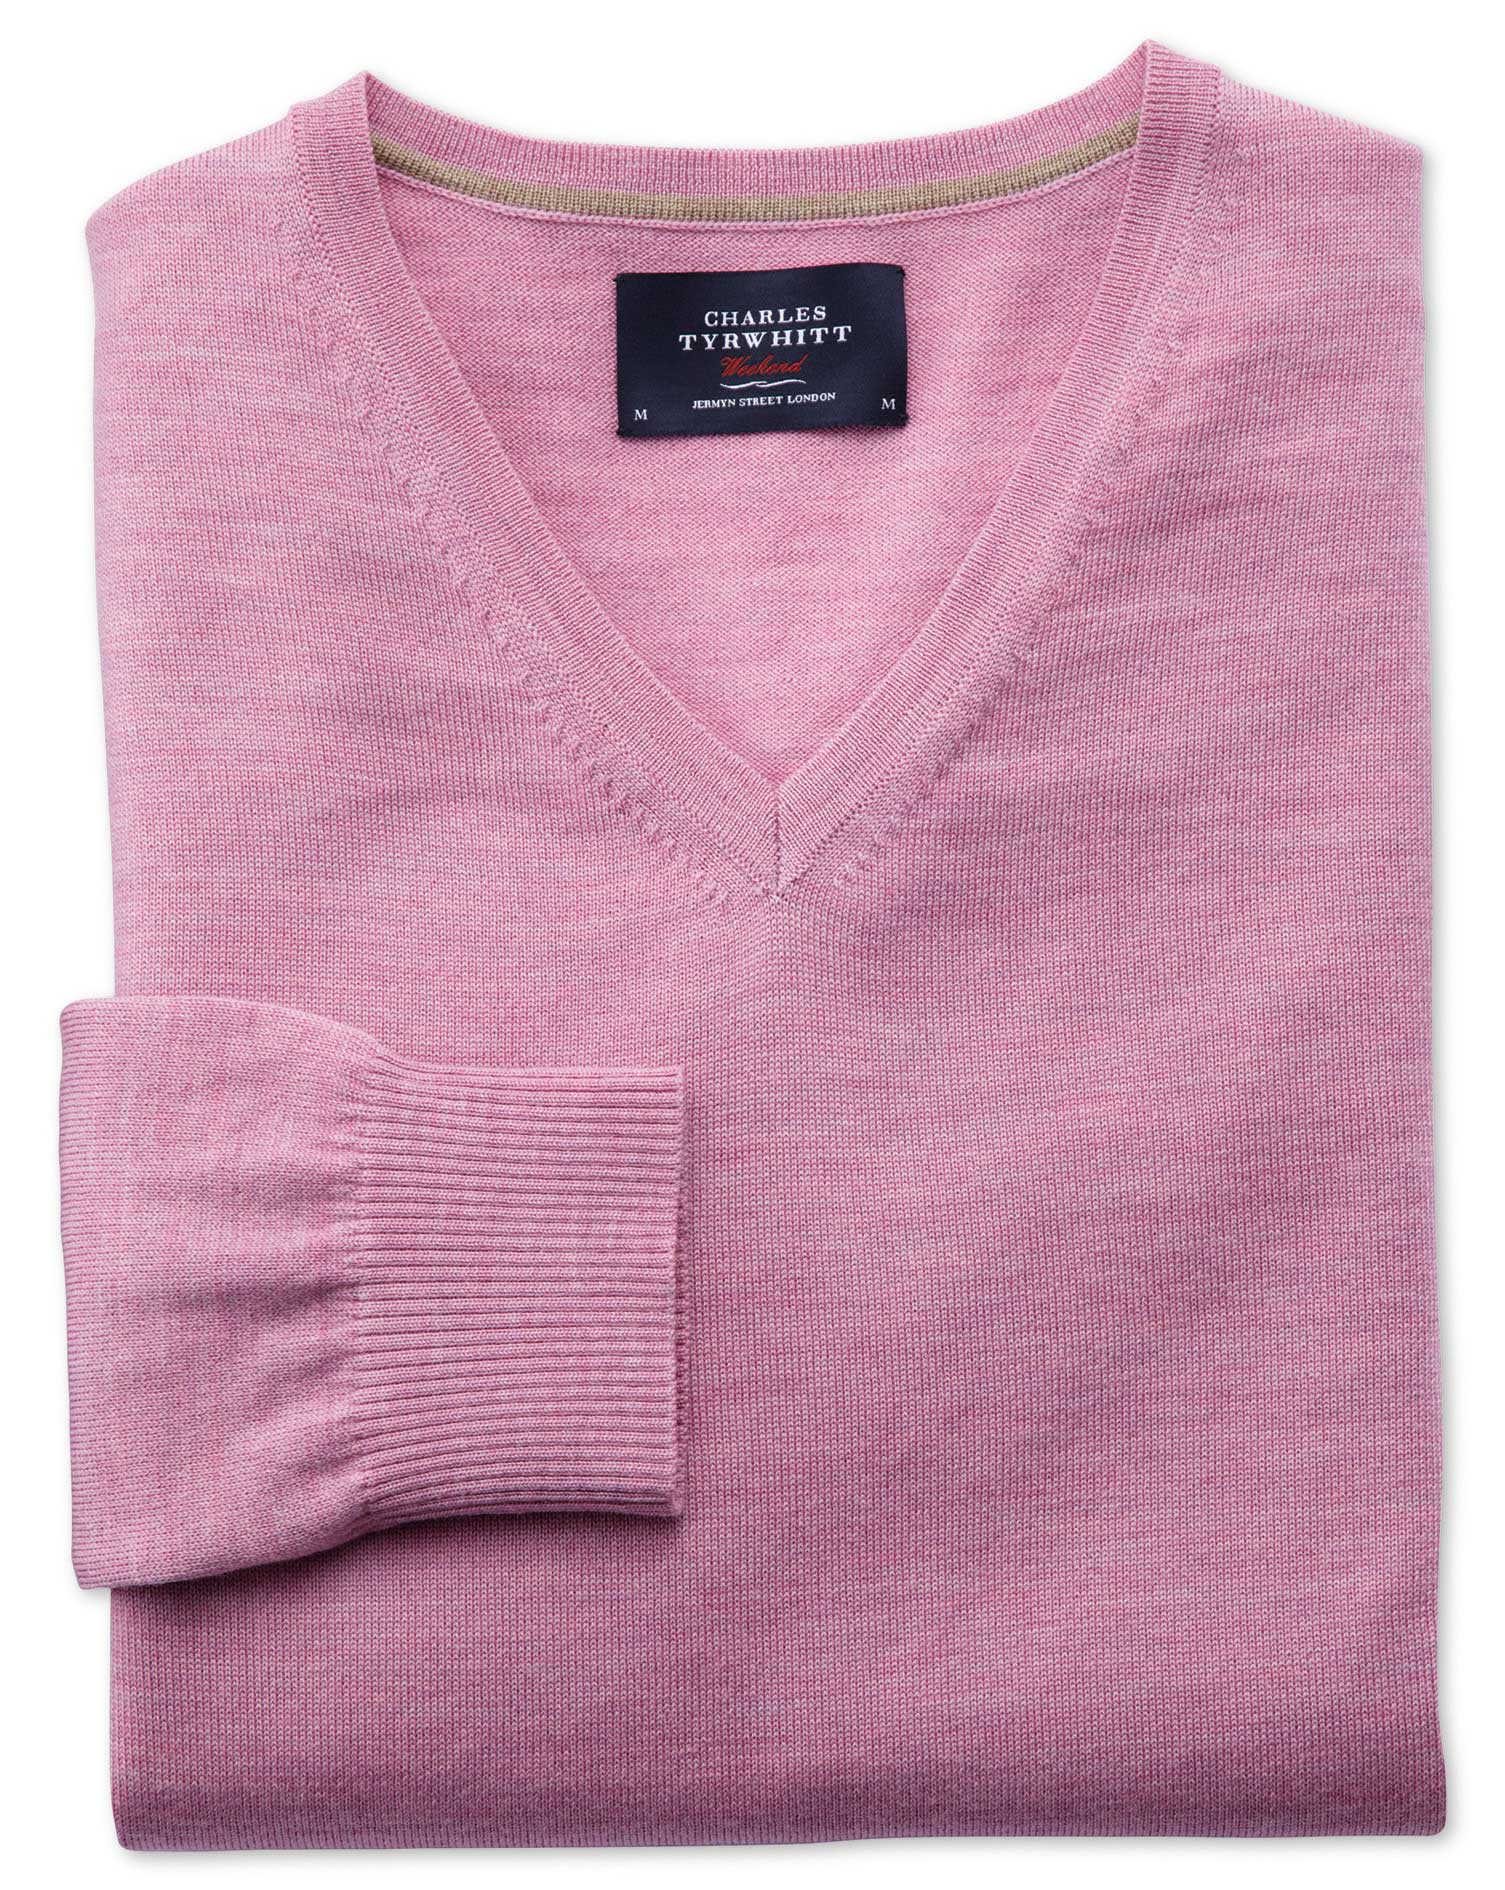 Light Pink Merino Wool V-Neck Jumper Size XL by Charles Tyrwhitt